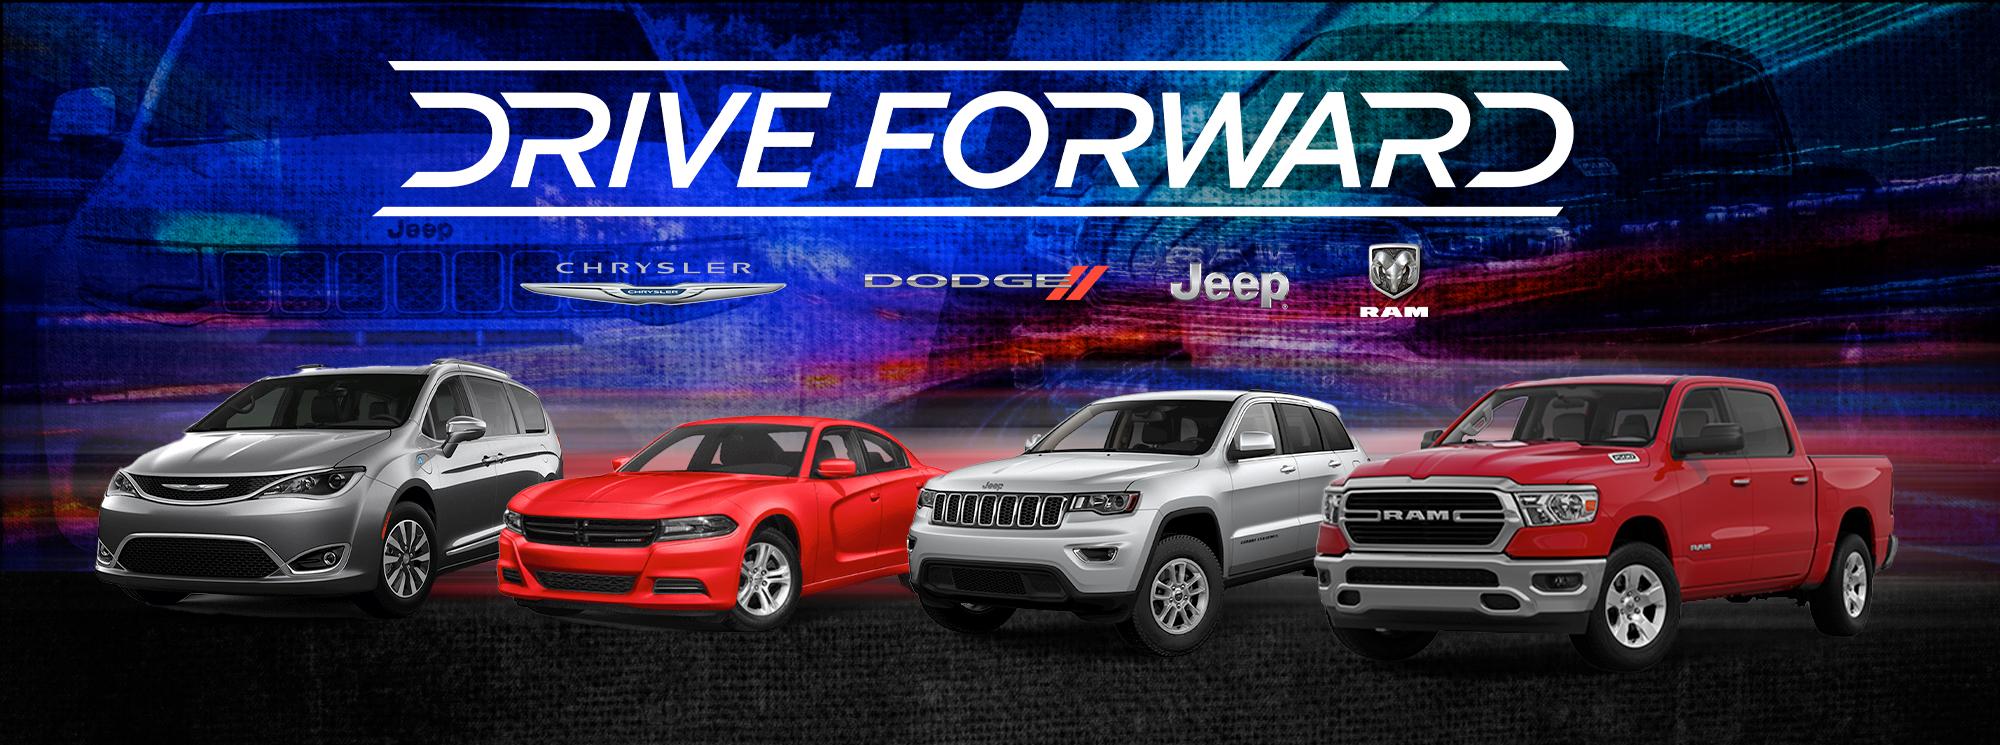 Drive Forward program